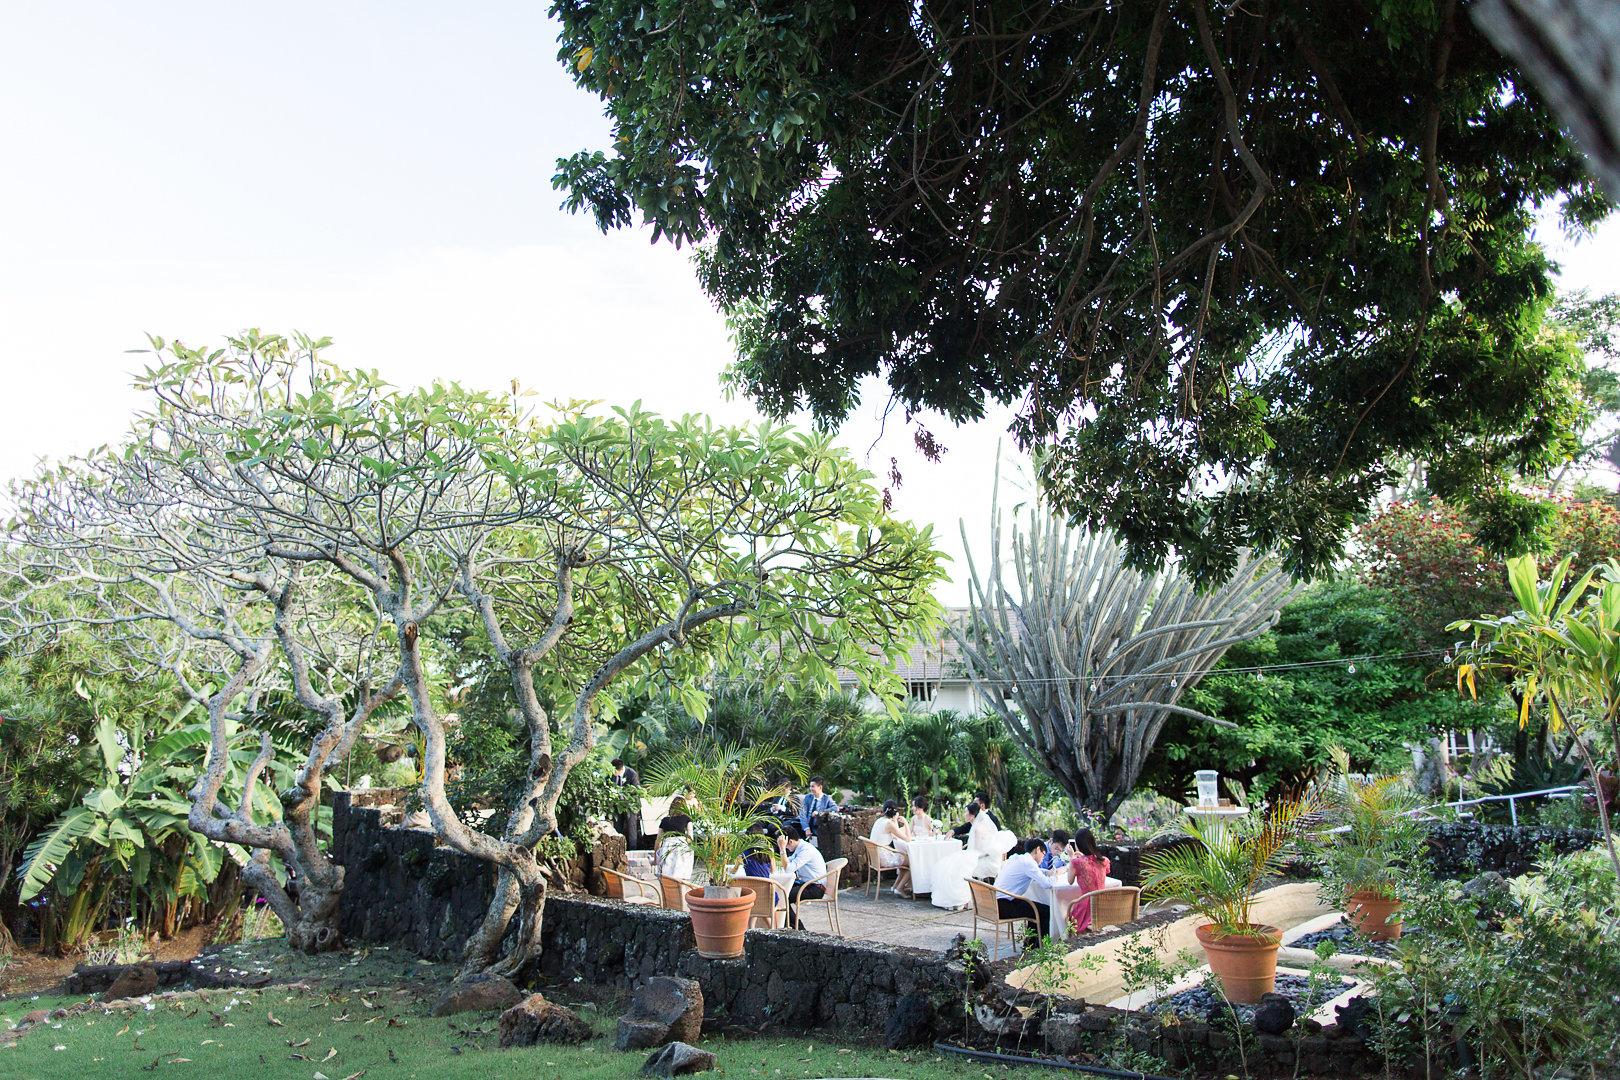 plantation-gardens-seating.jpg